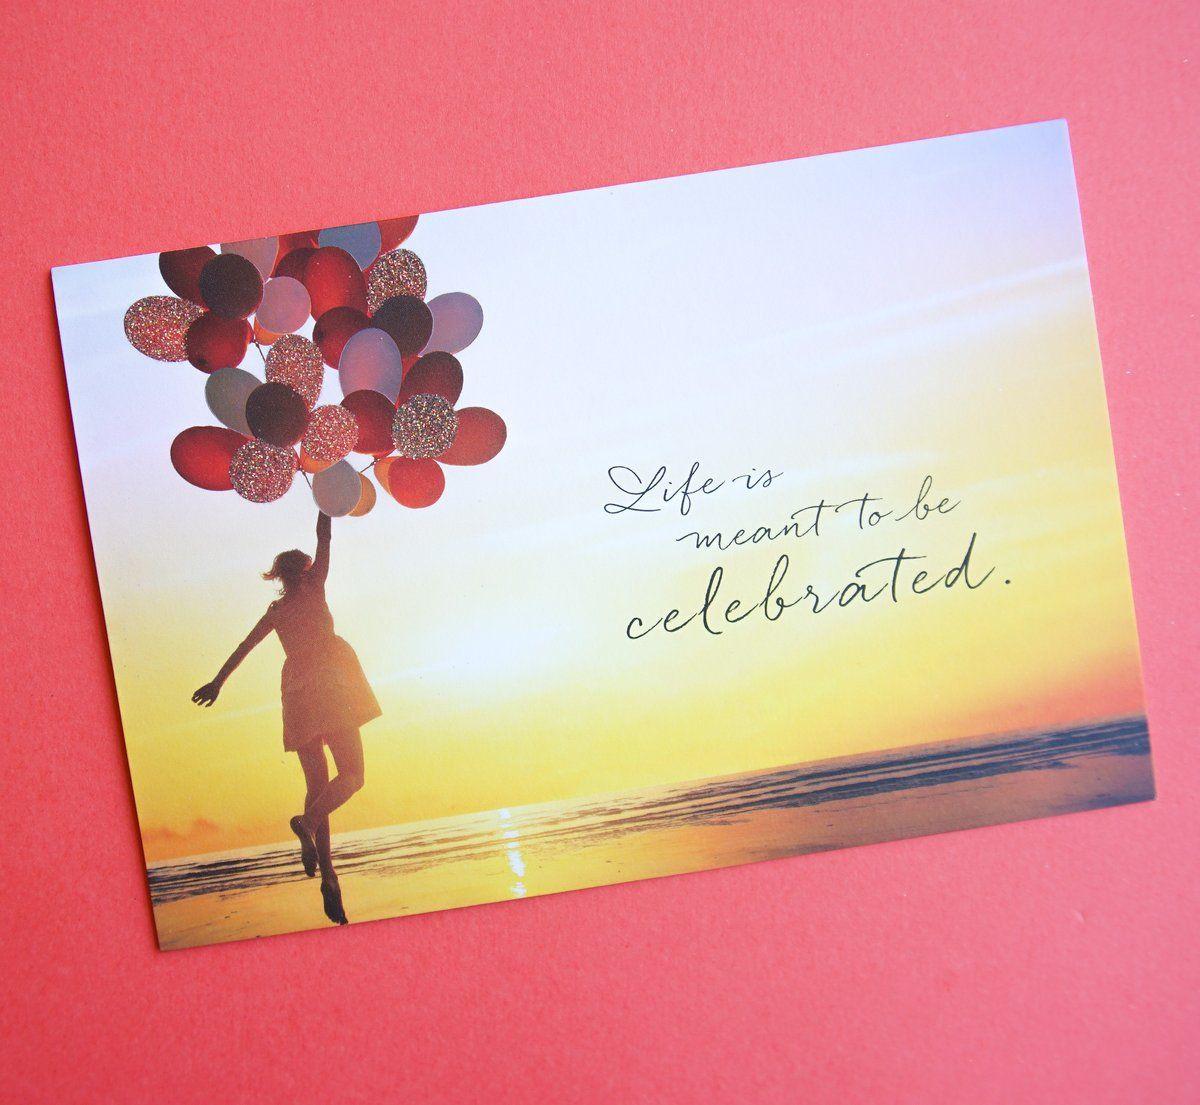 Fly Away Sunset Balloons Birthday Card Snapshot Birthday Balloons Birthday Cards Balloons